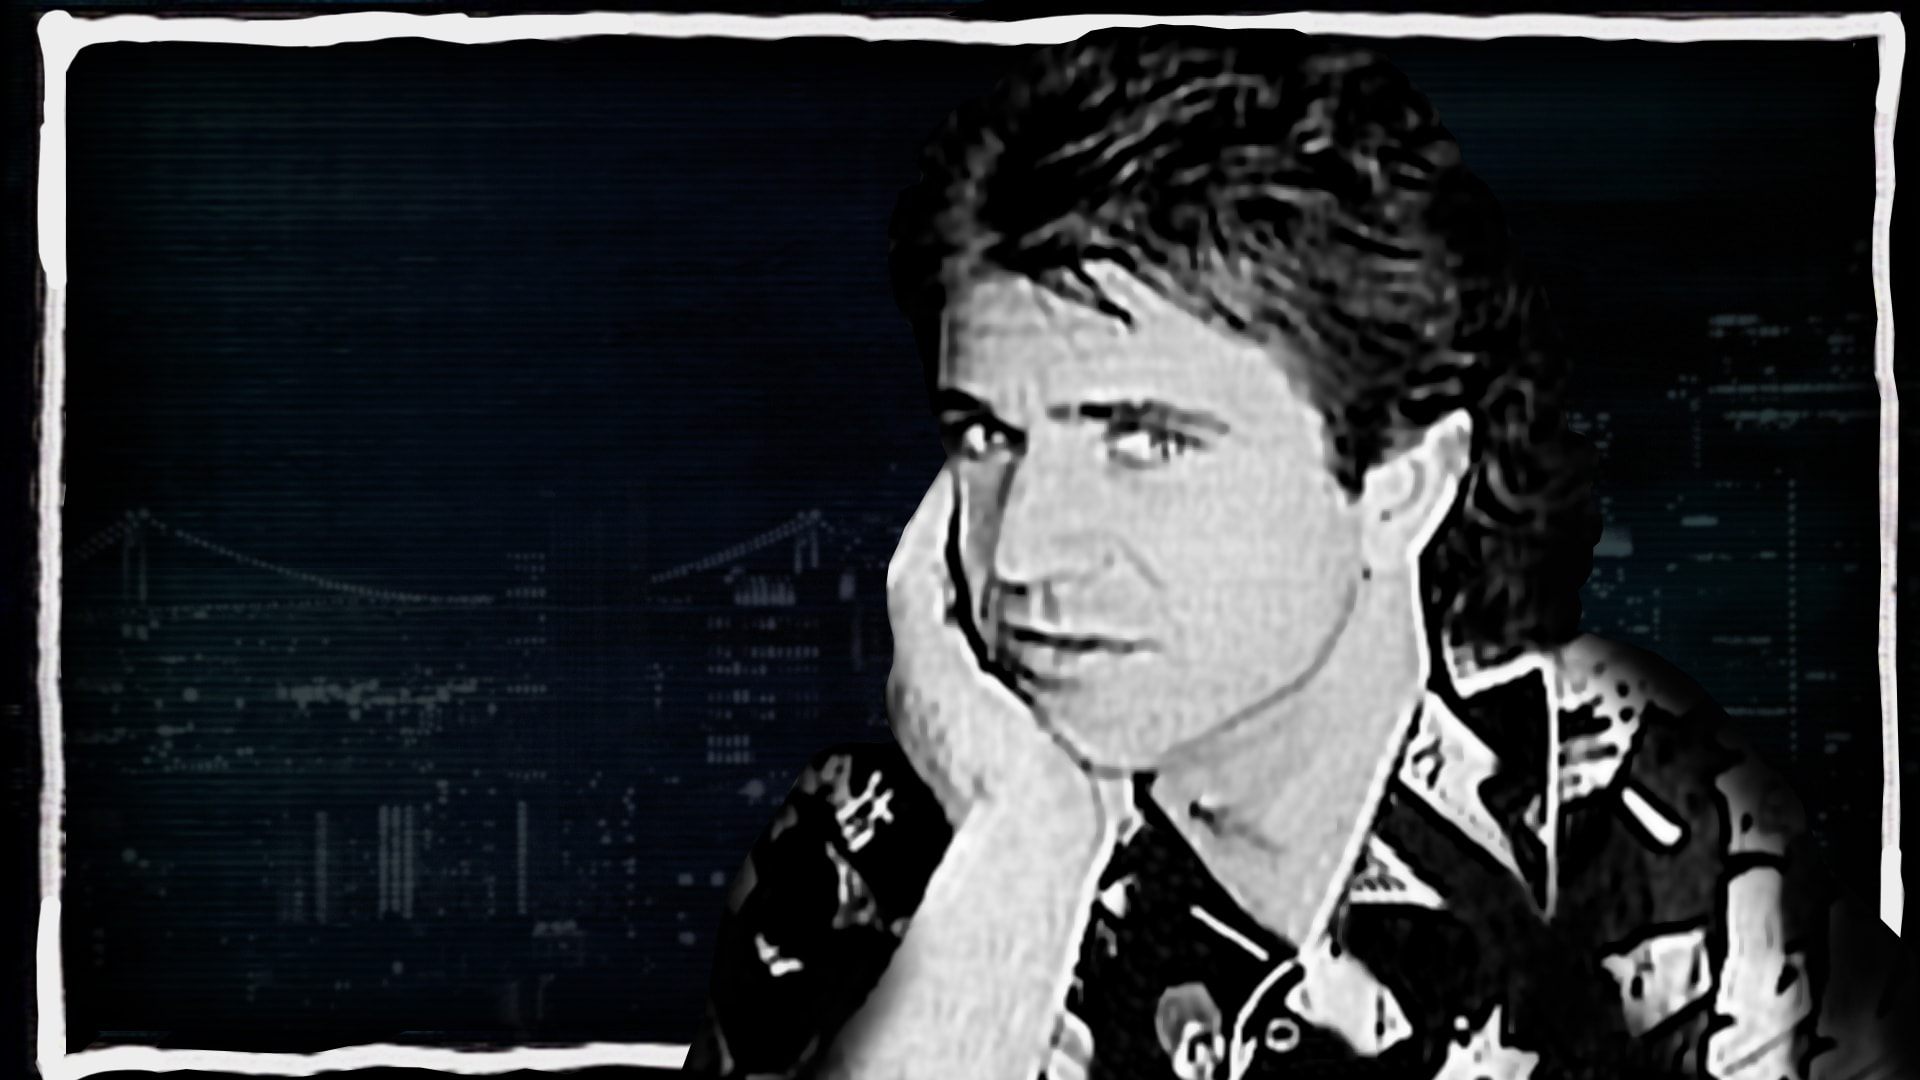 Mel Gibson: April 1, 1989